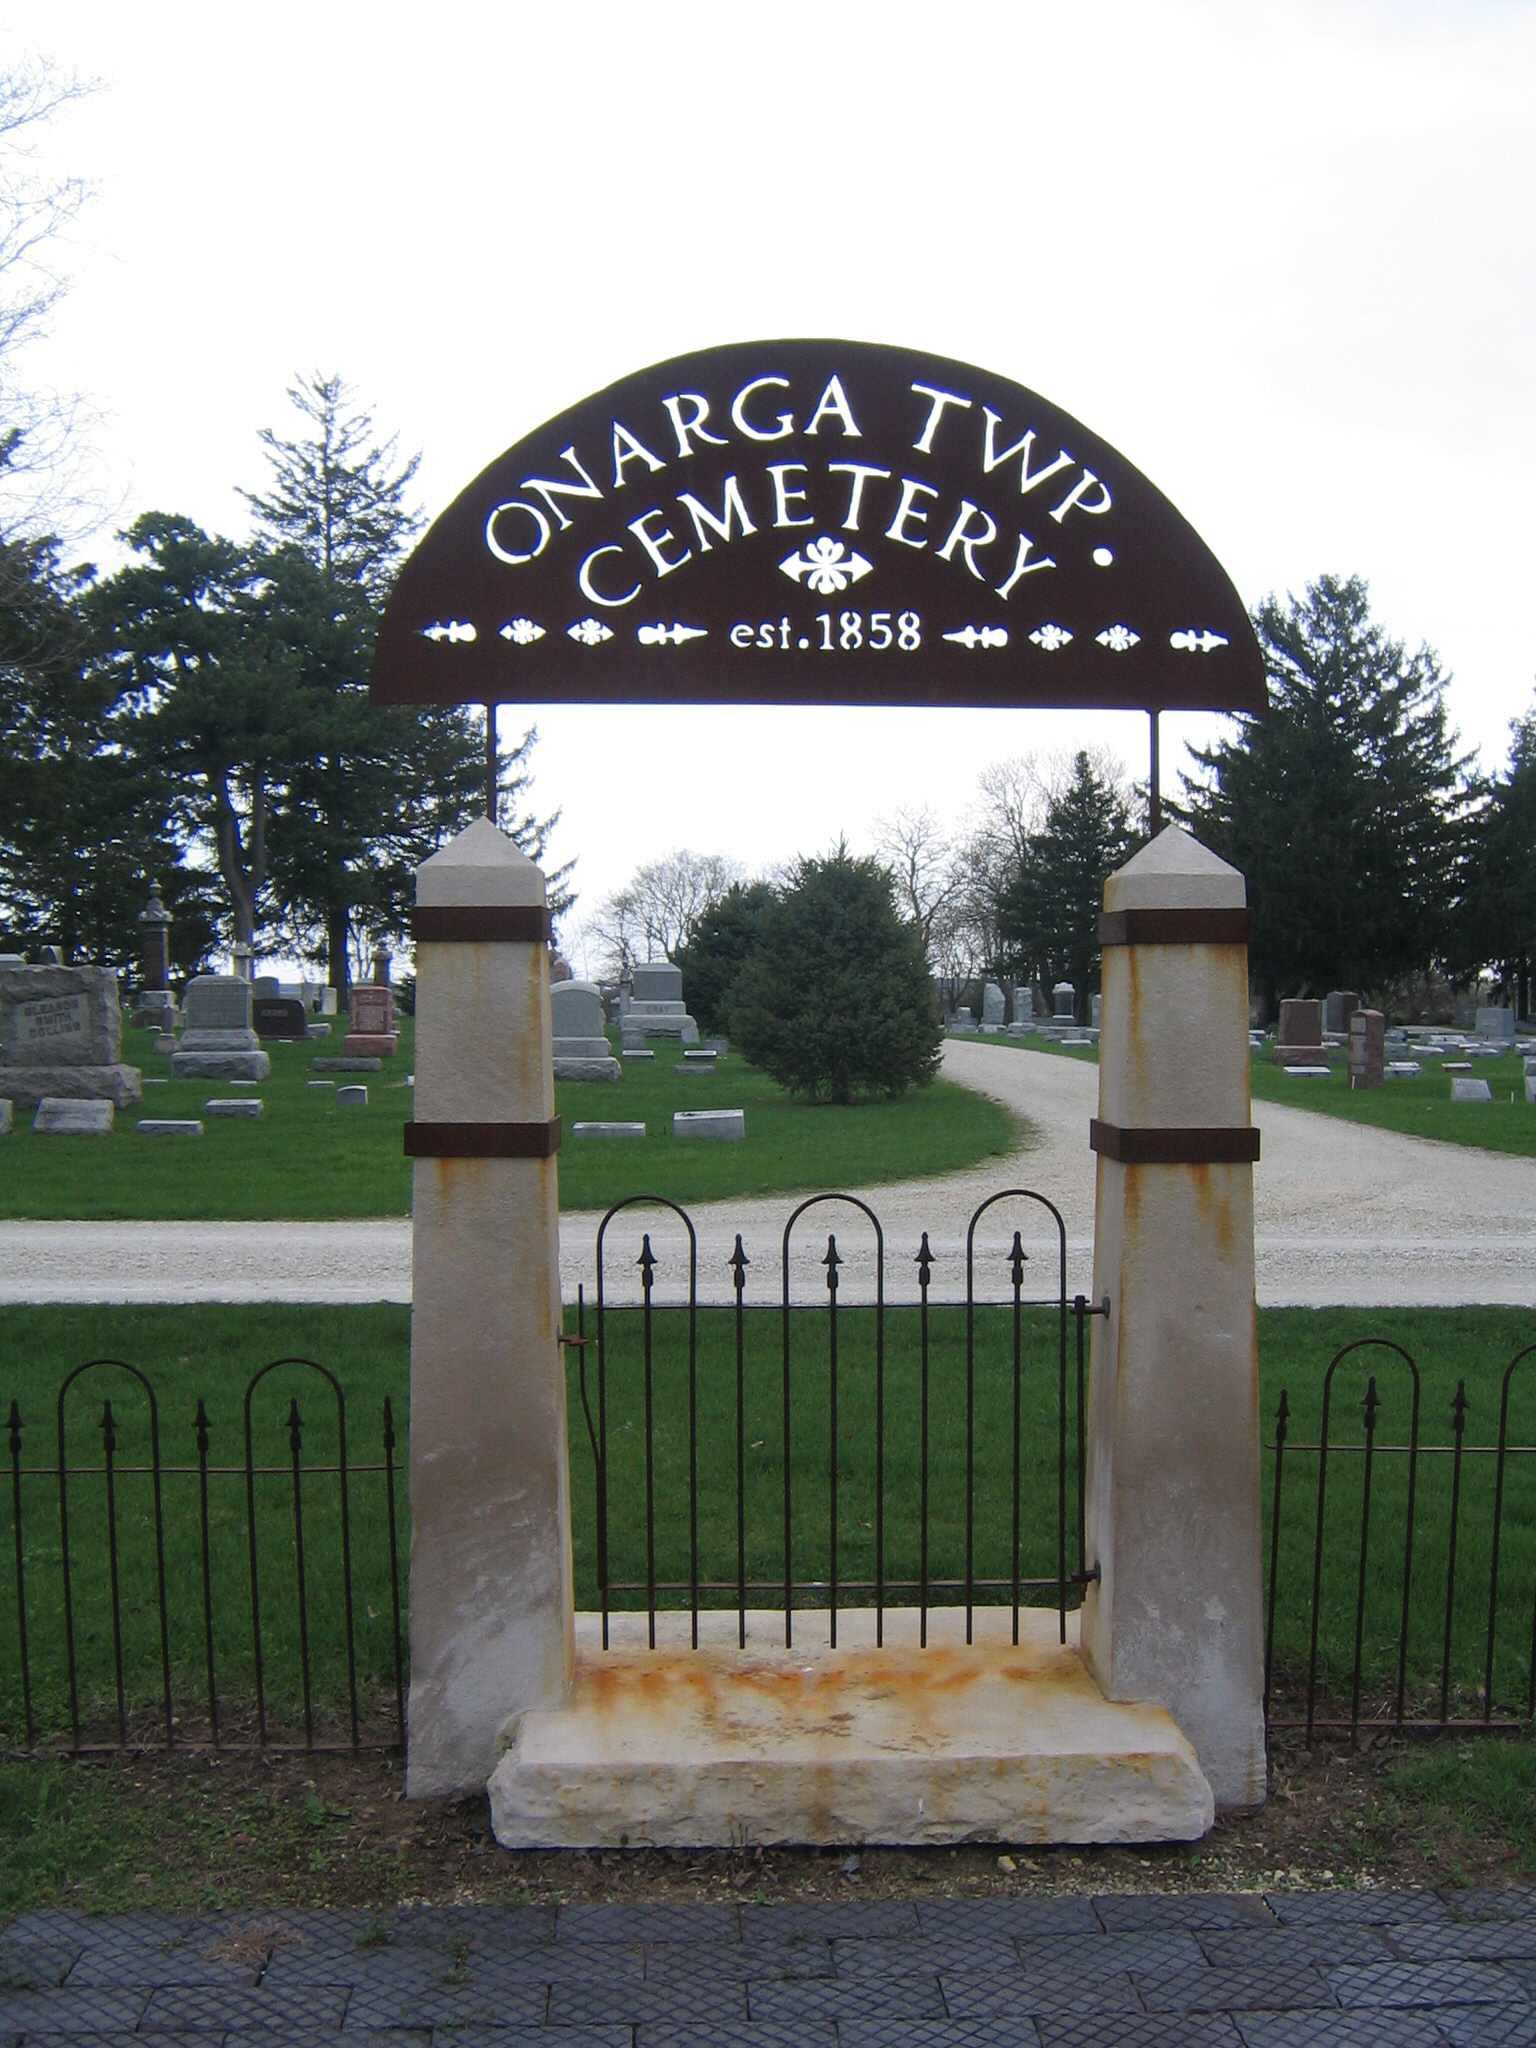 Onarga Cemetery